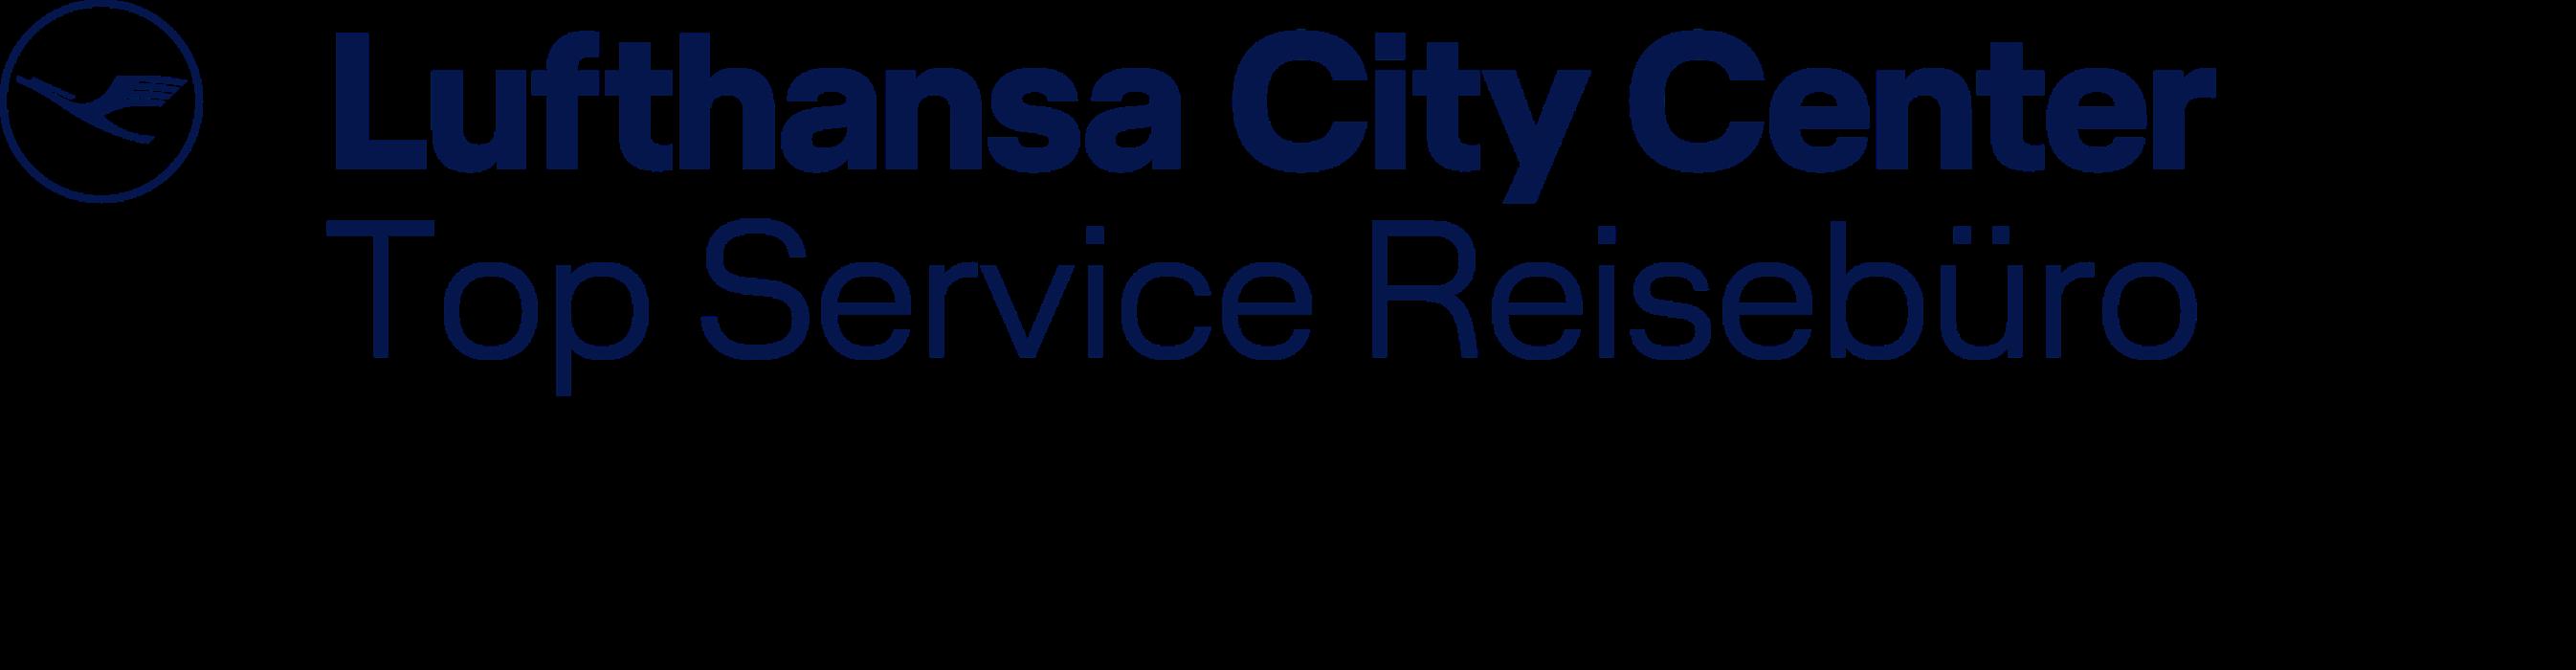 Top Service Reisebüro Lufthansa City Center